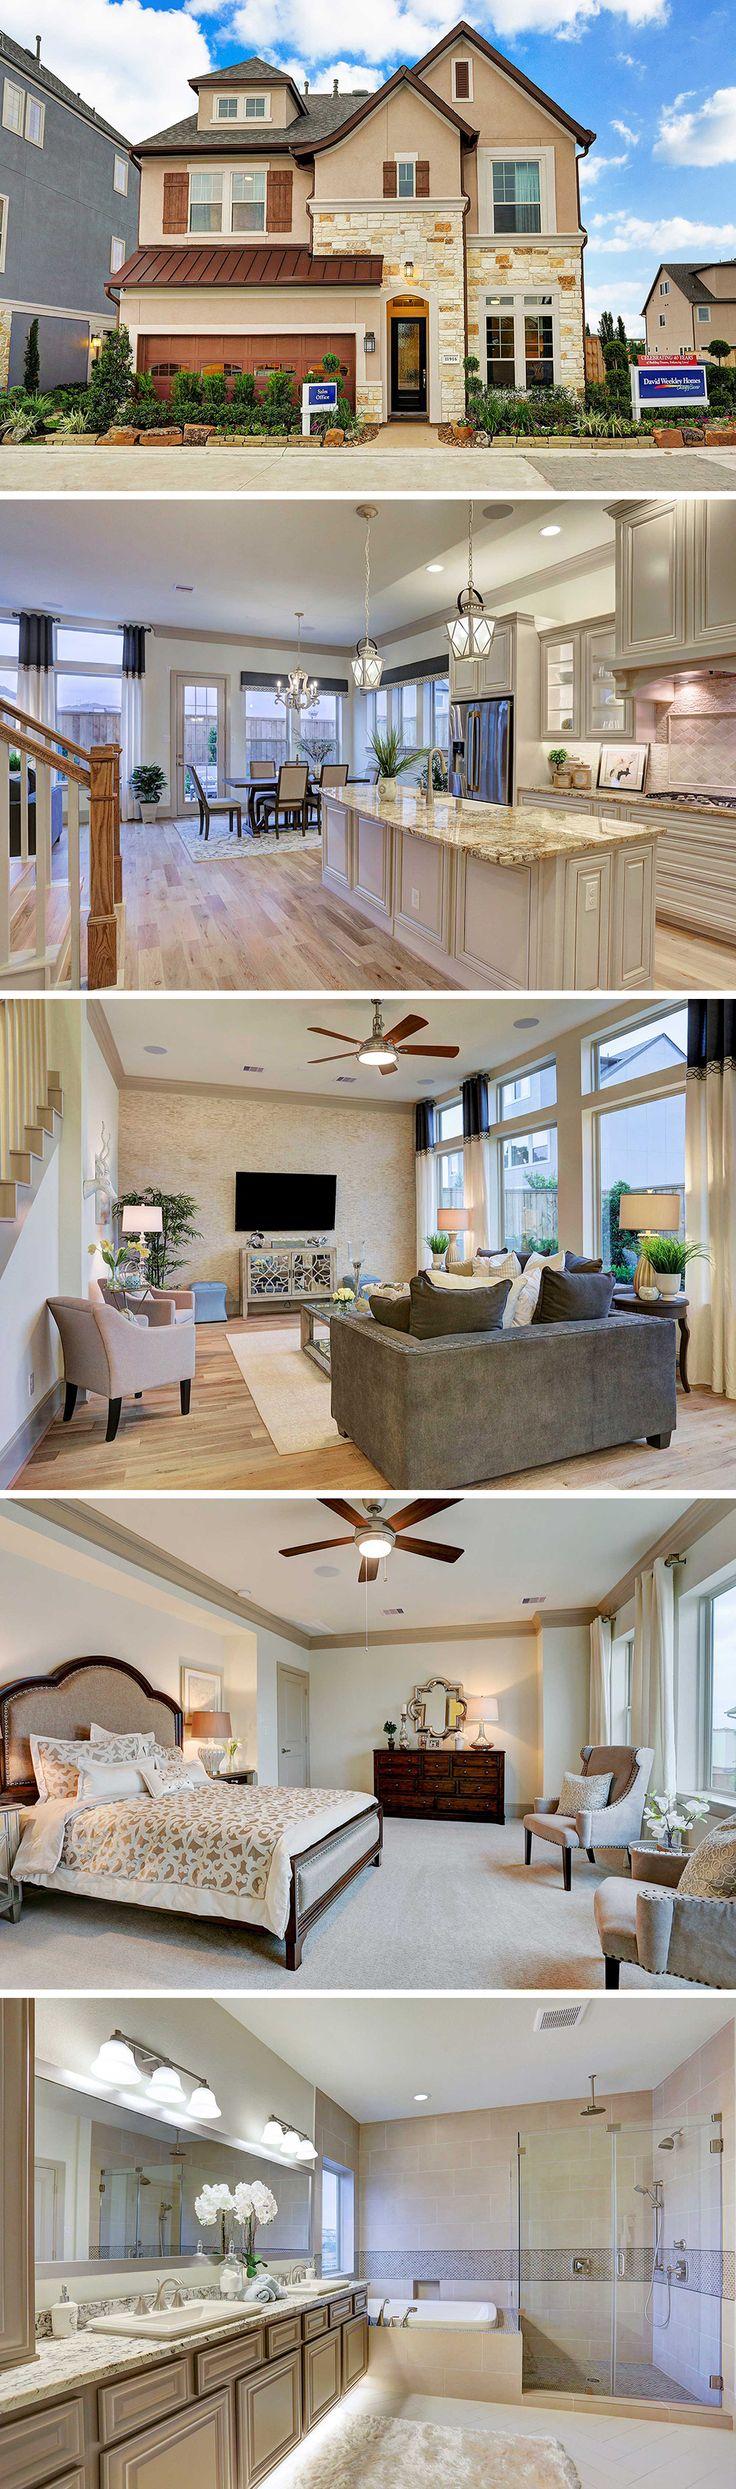 51 best houston tx homes images on pinterest home home